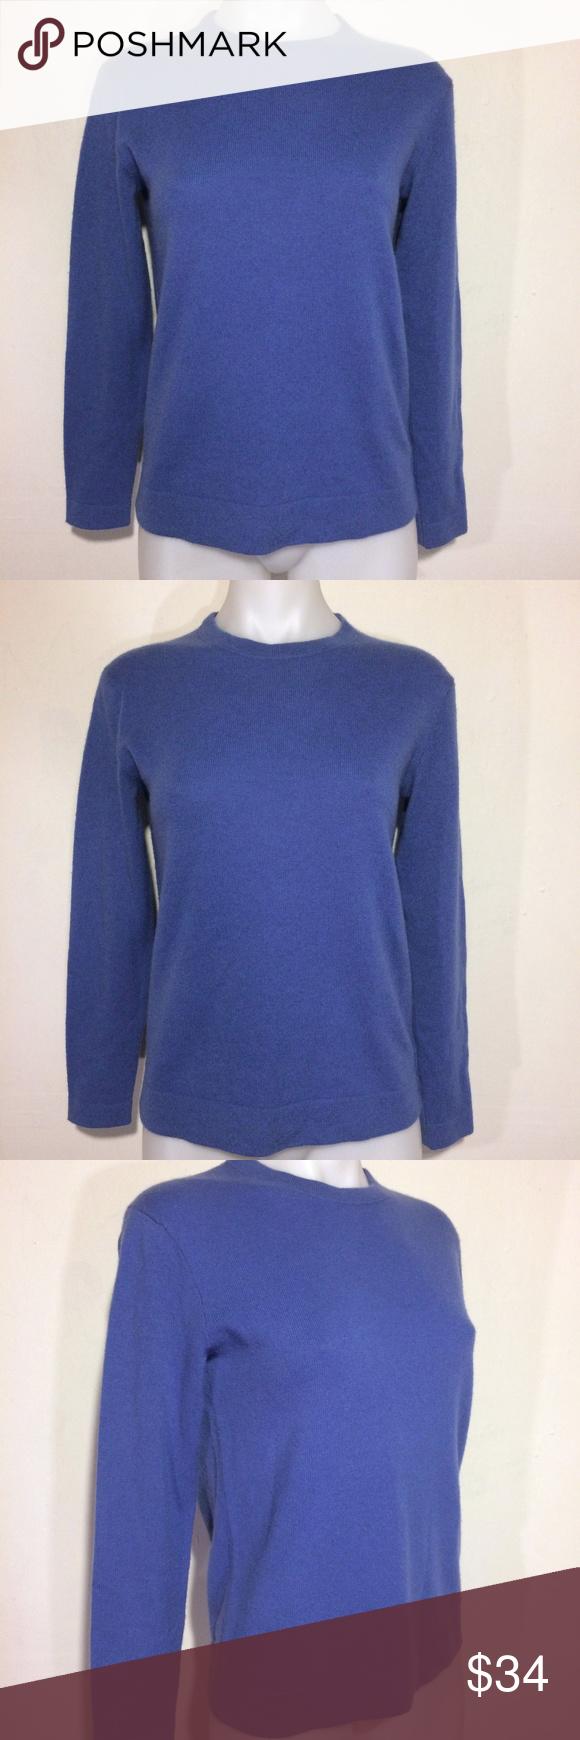 Polo Ralph Lauren periwinkle cashmere sweater | Polo ralph lauren ...